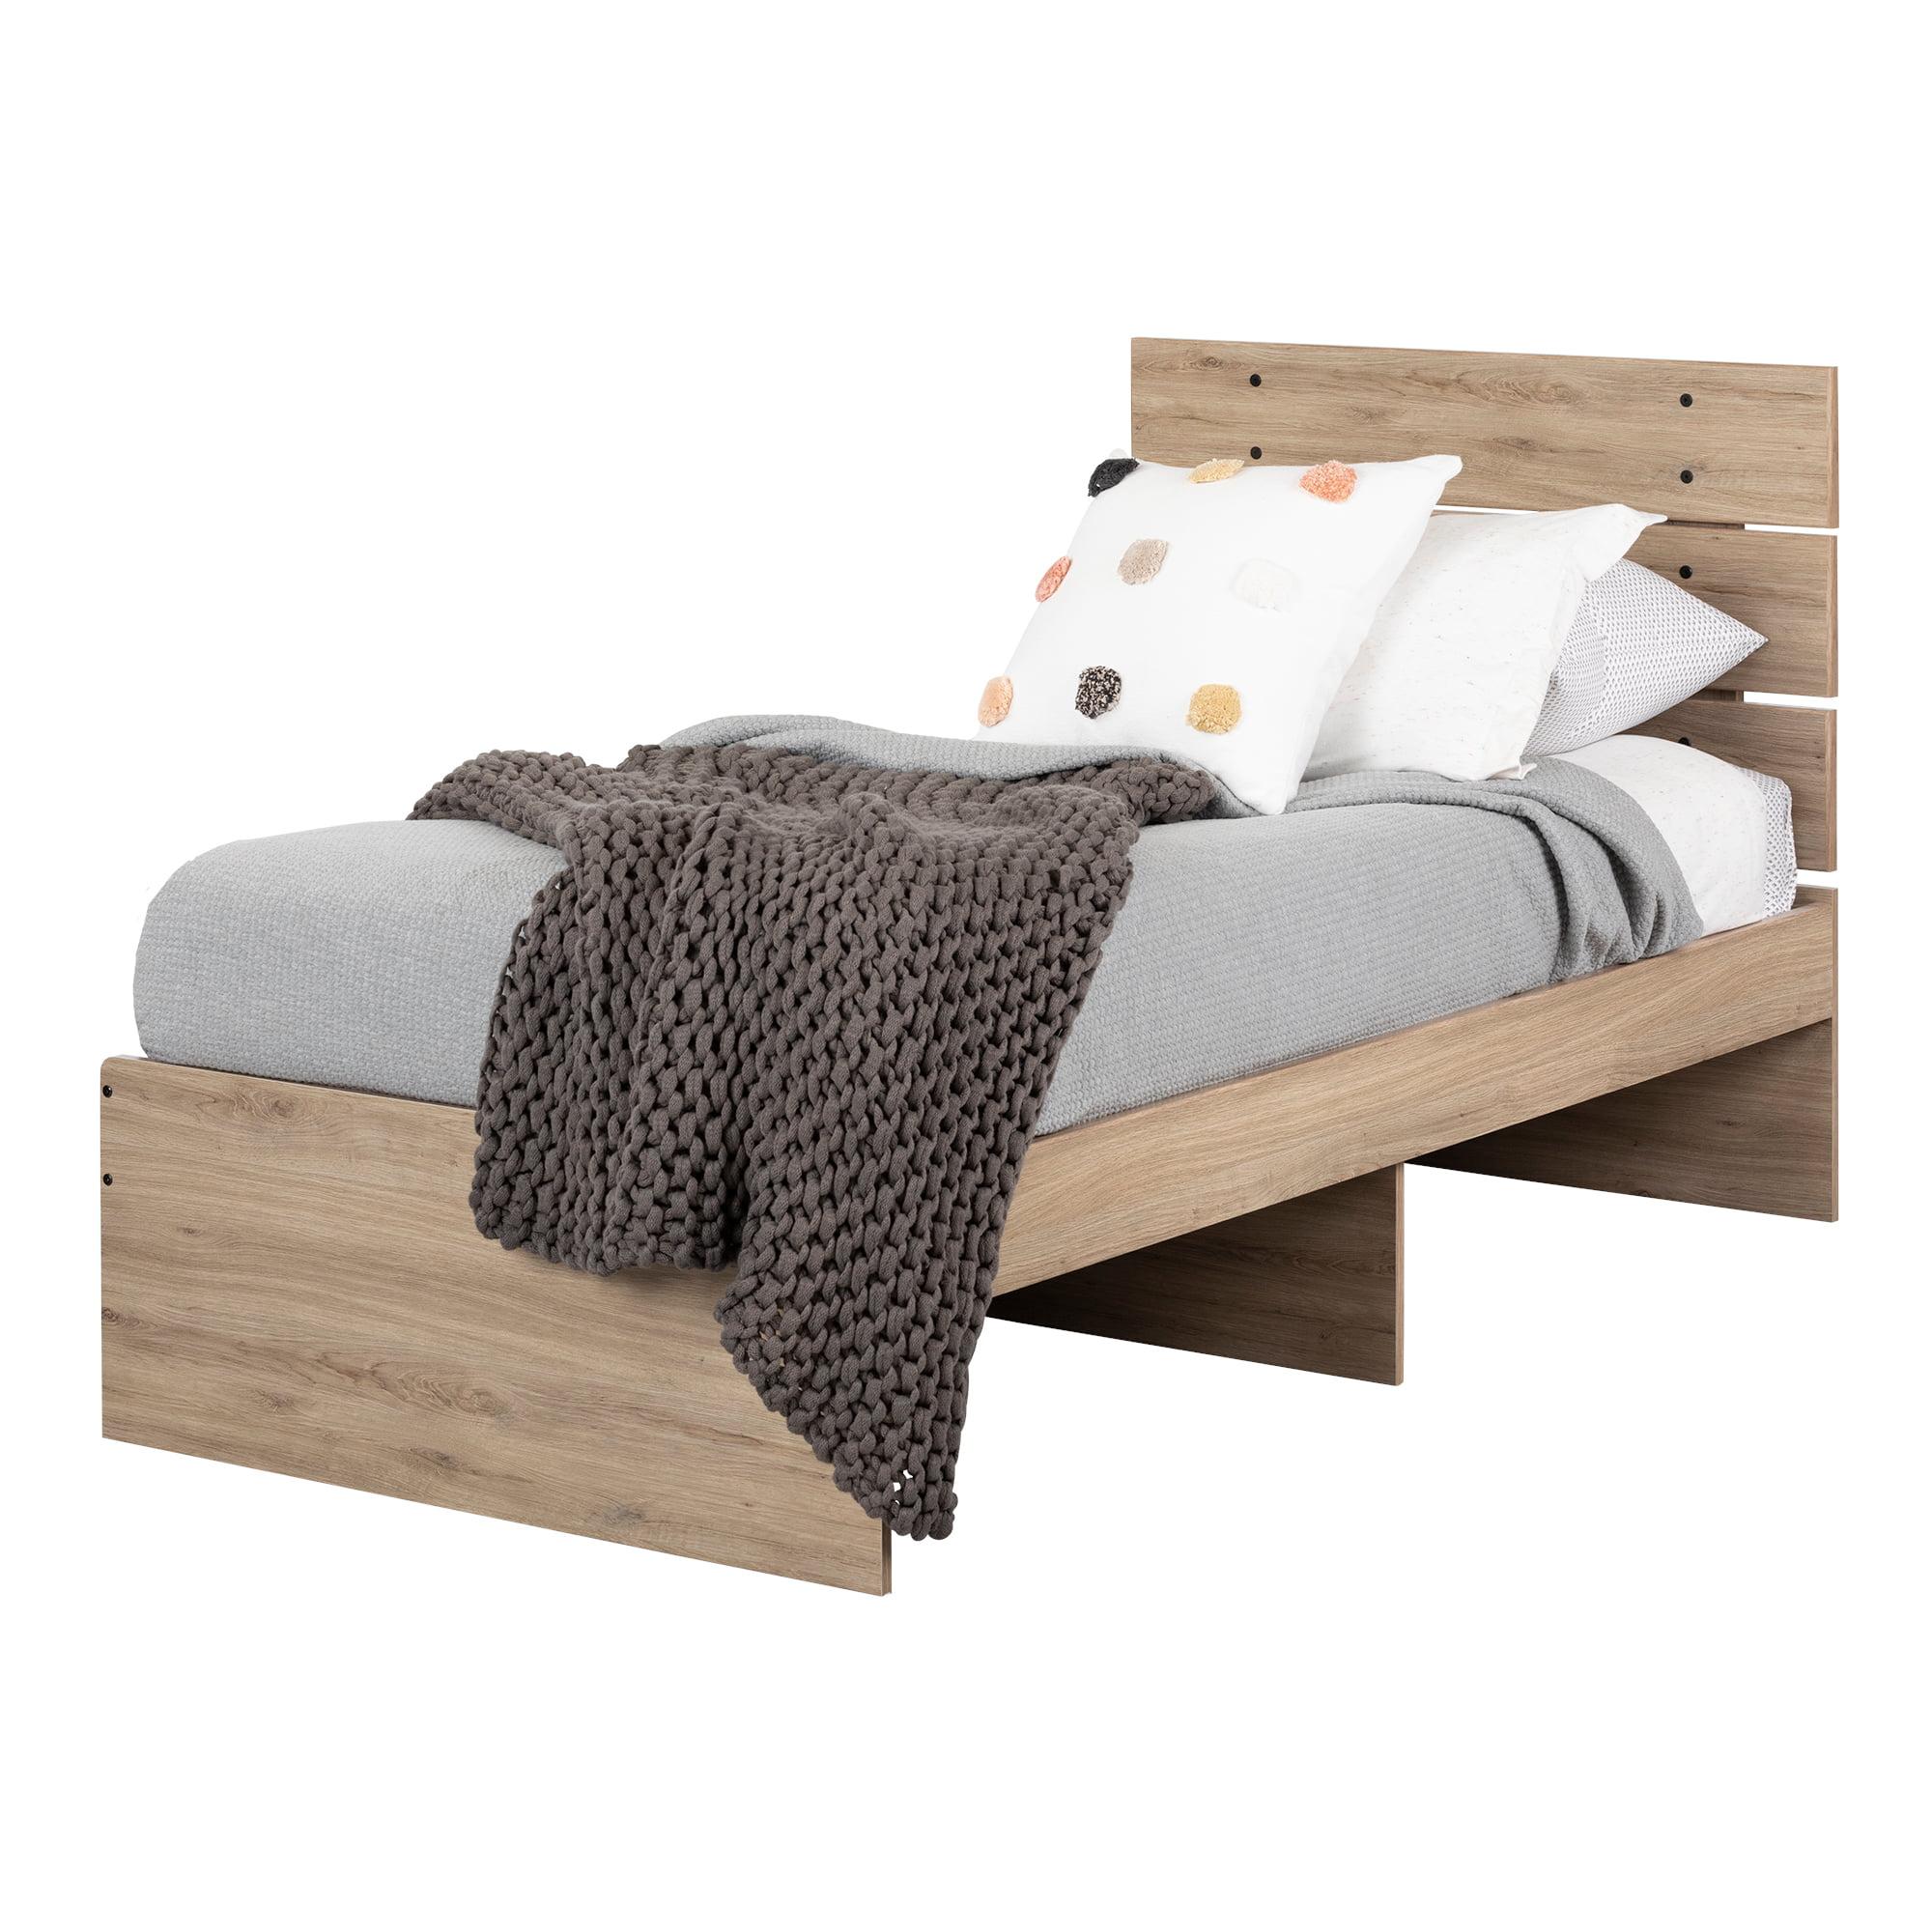 Rustic Oak And Matte Black Twin South Shore 11022 Induzy Set Bed And Headboard Kit Kids Furniture Kids Furniture Room Decor